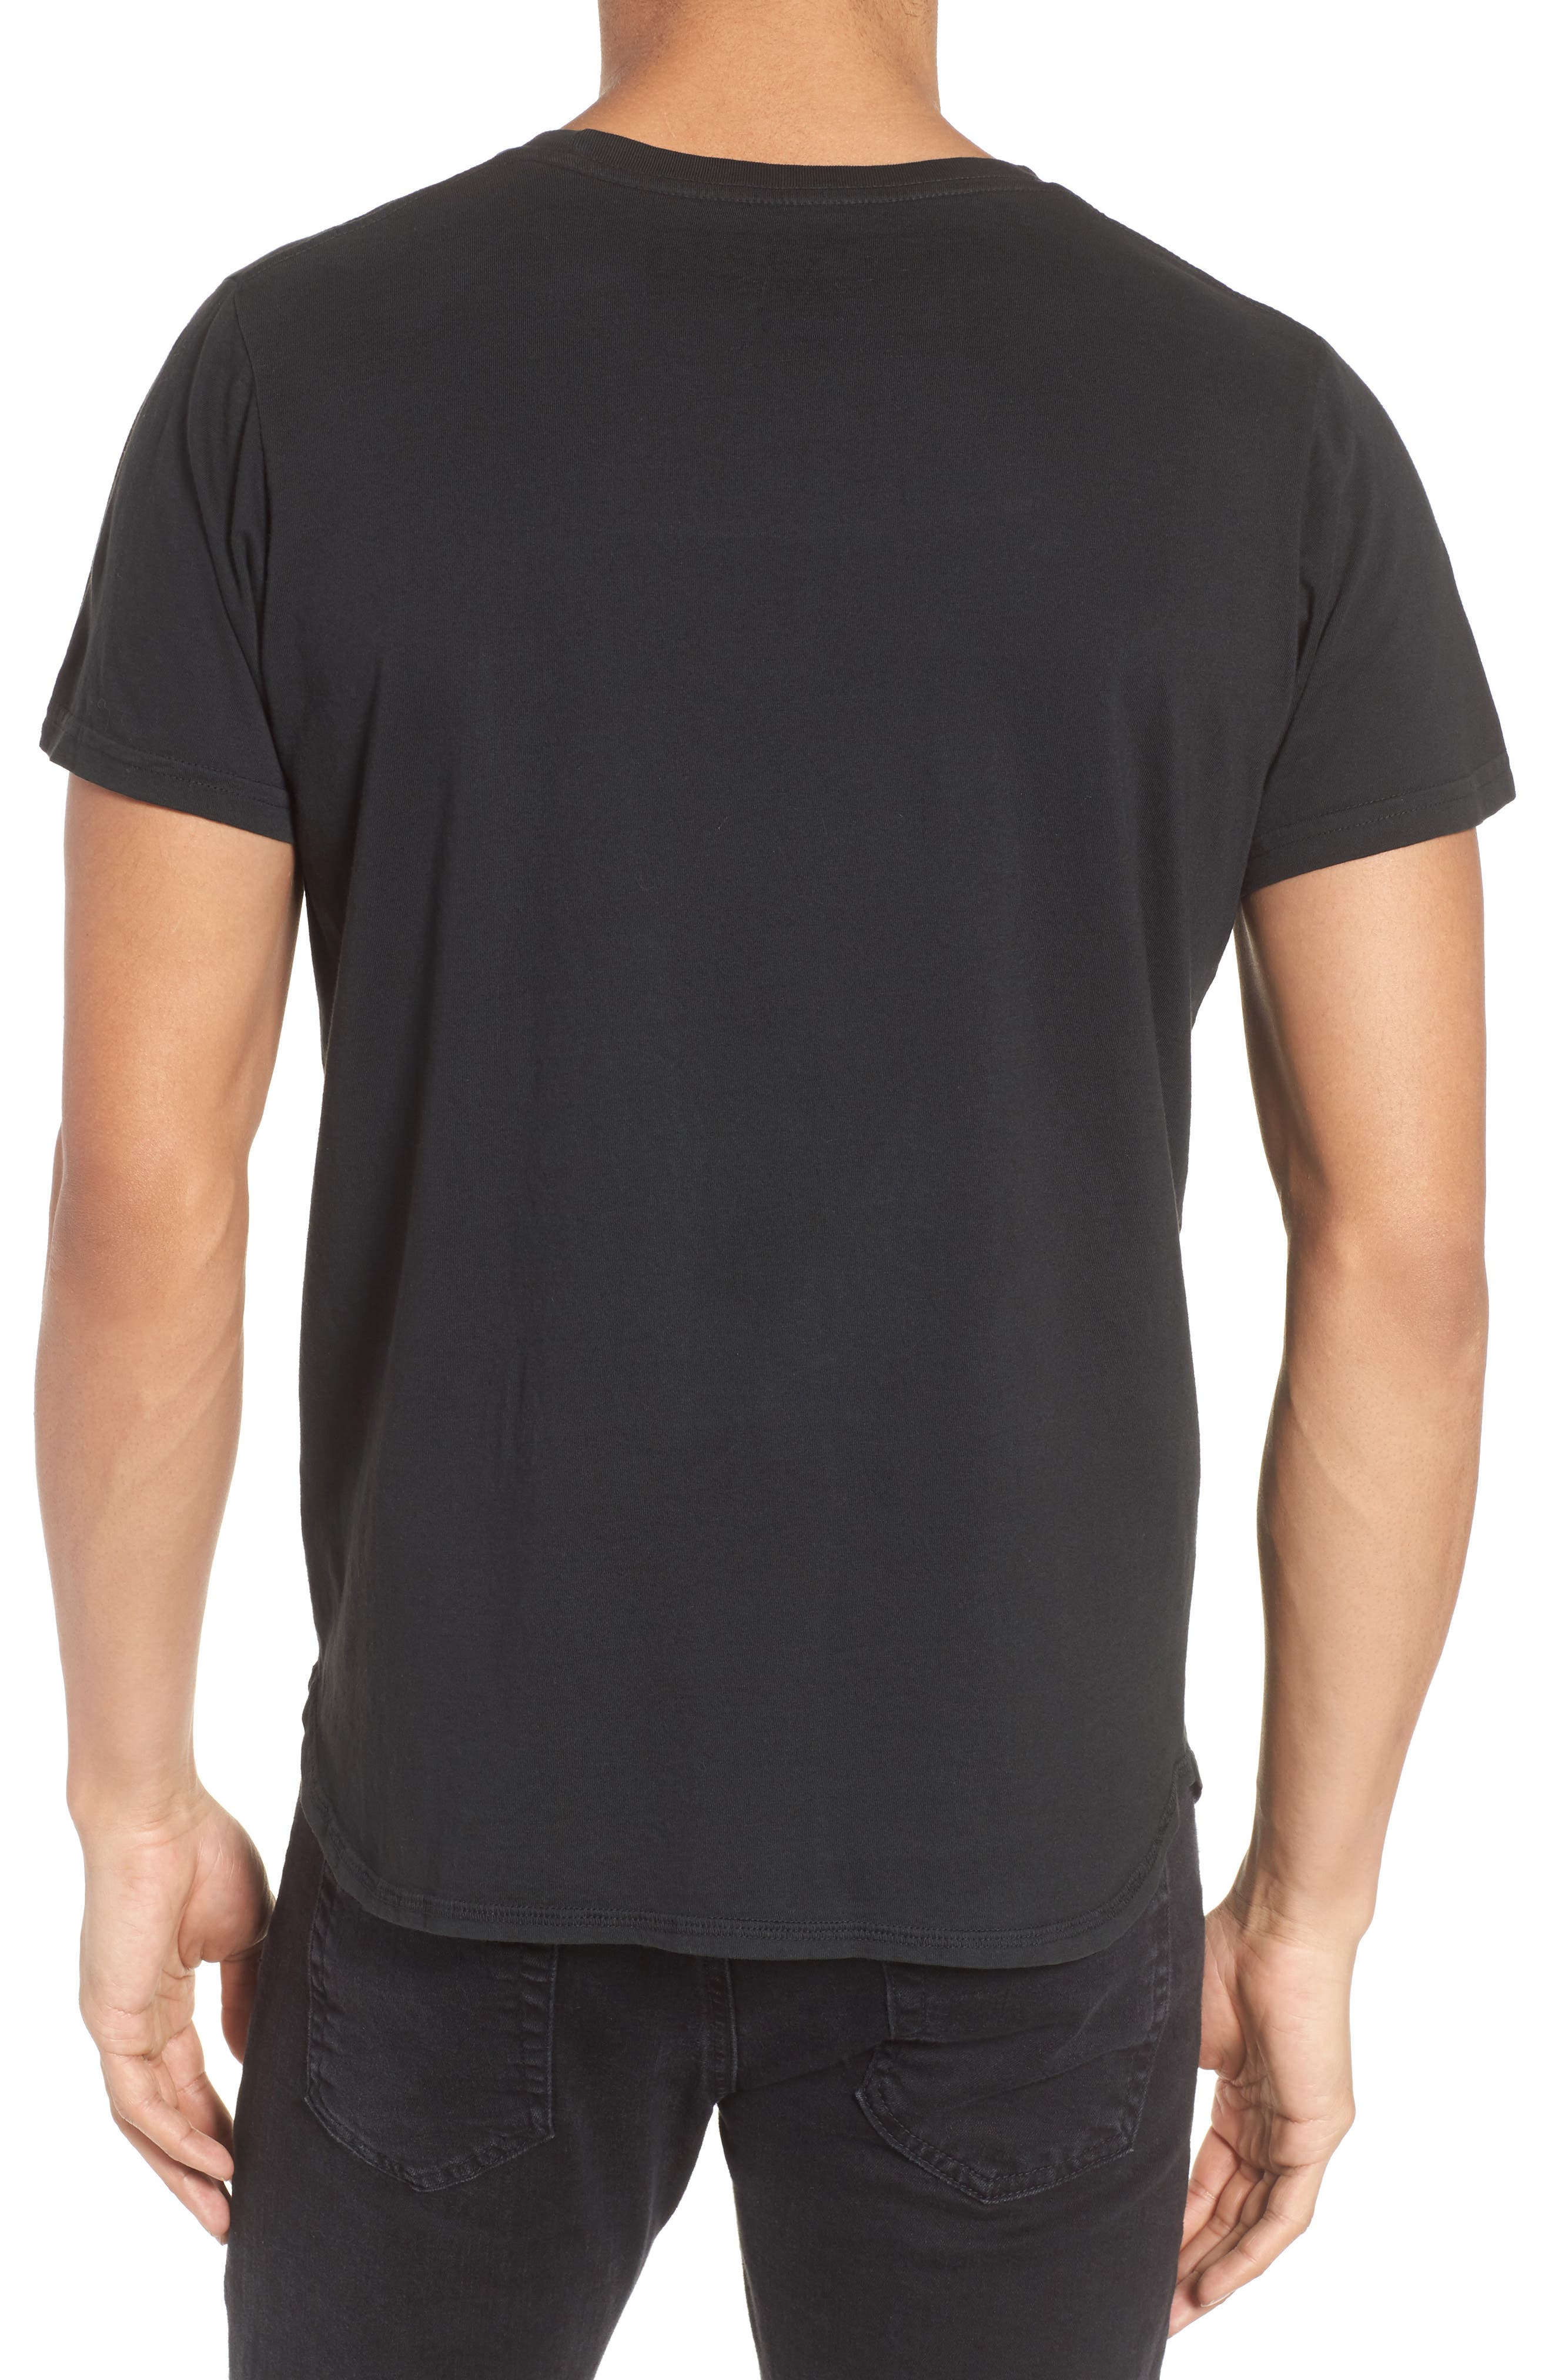 Wide Awake Graphic T-Shirt,                             Alternate thumbnail 2, color,                             Dusty Black